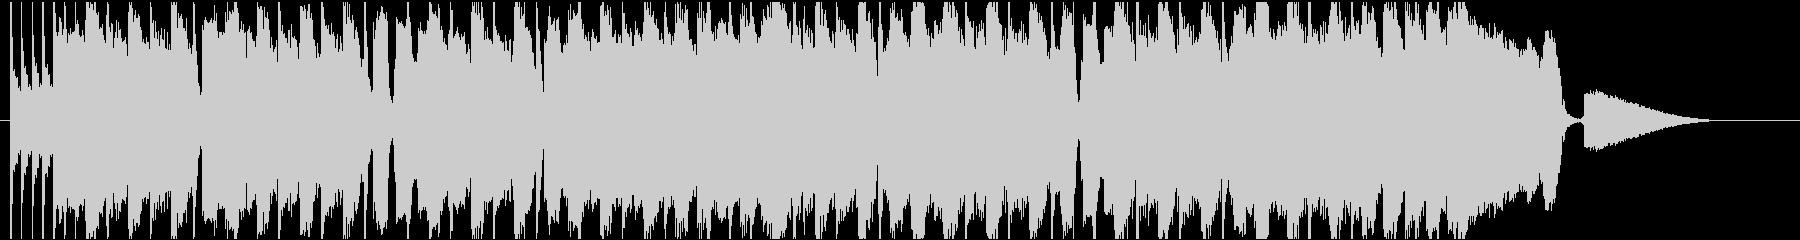 CM動画のオープニングに合うROCKの未再生の波形